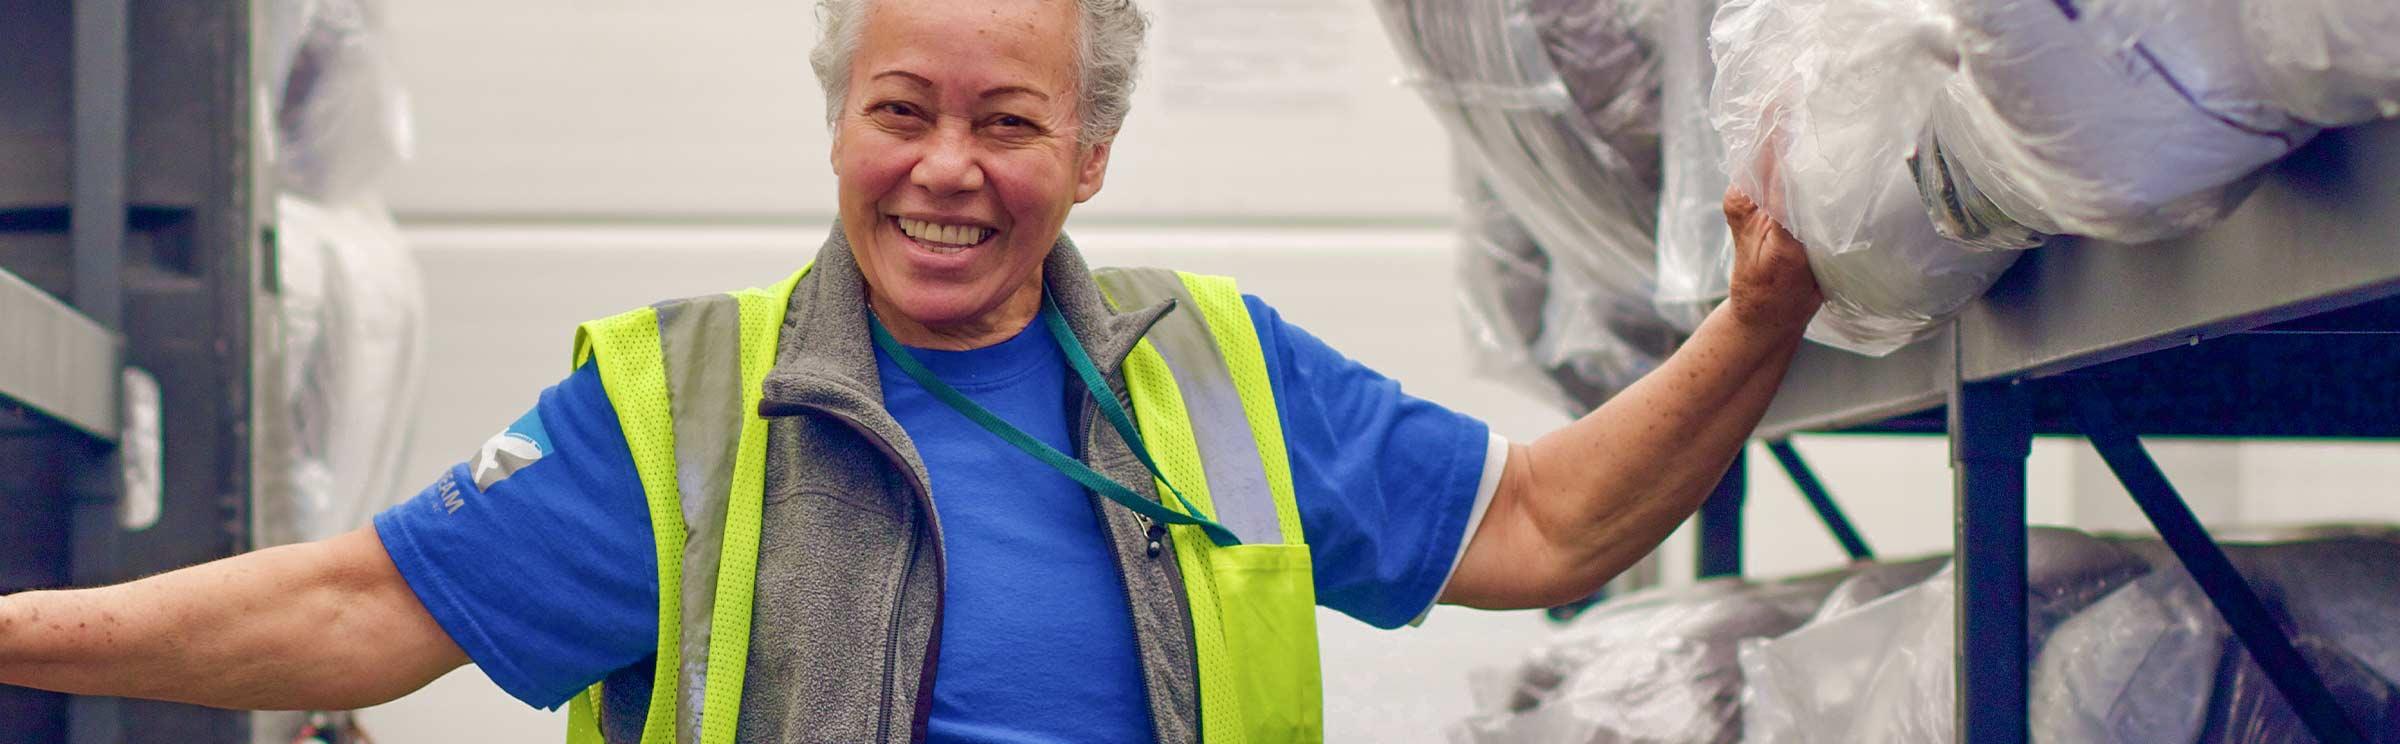 Jetstream success stories ground services employee in warehouse